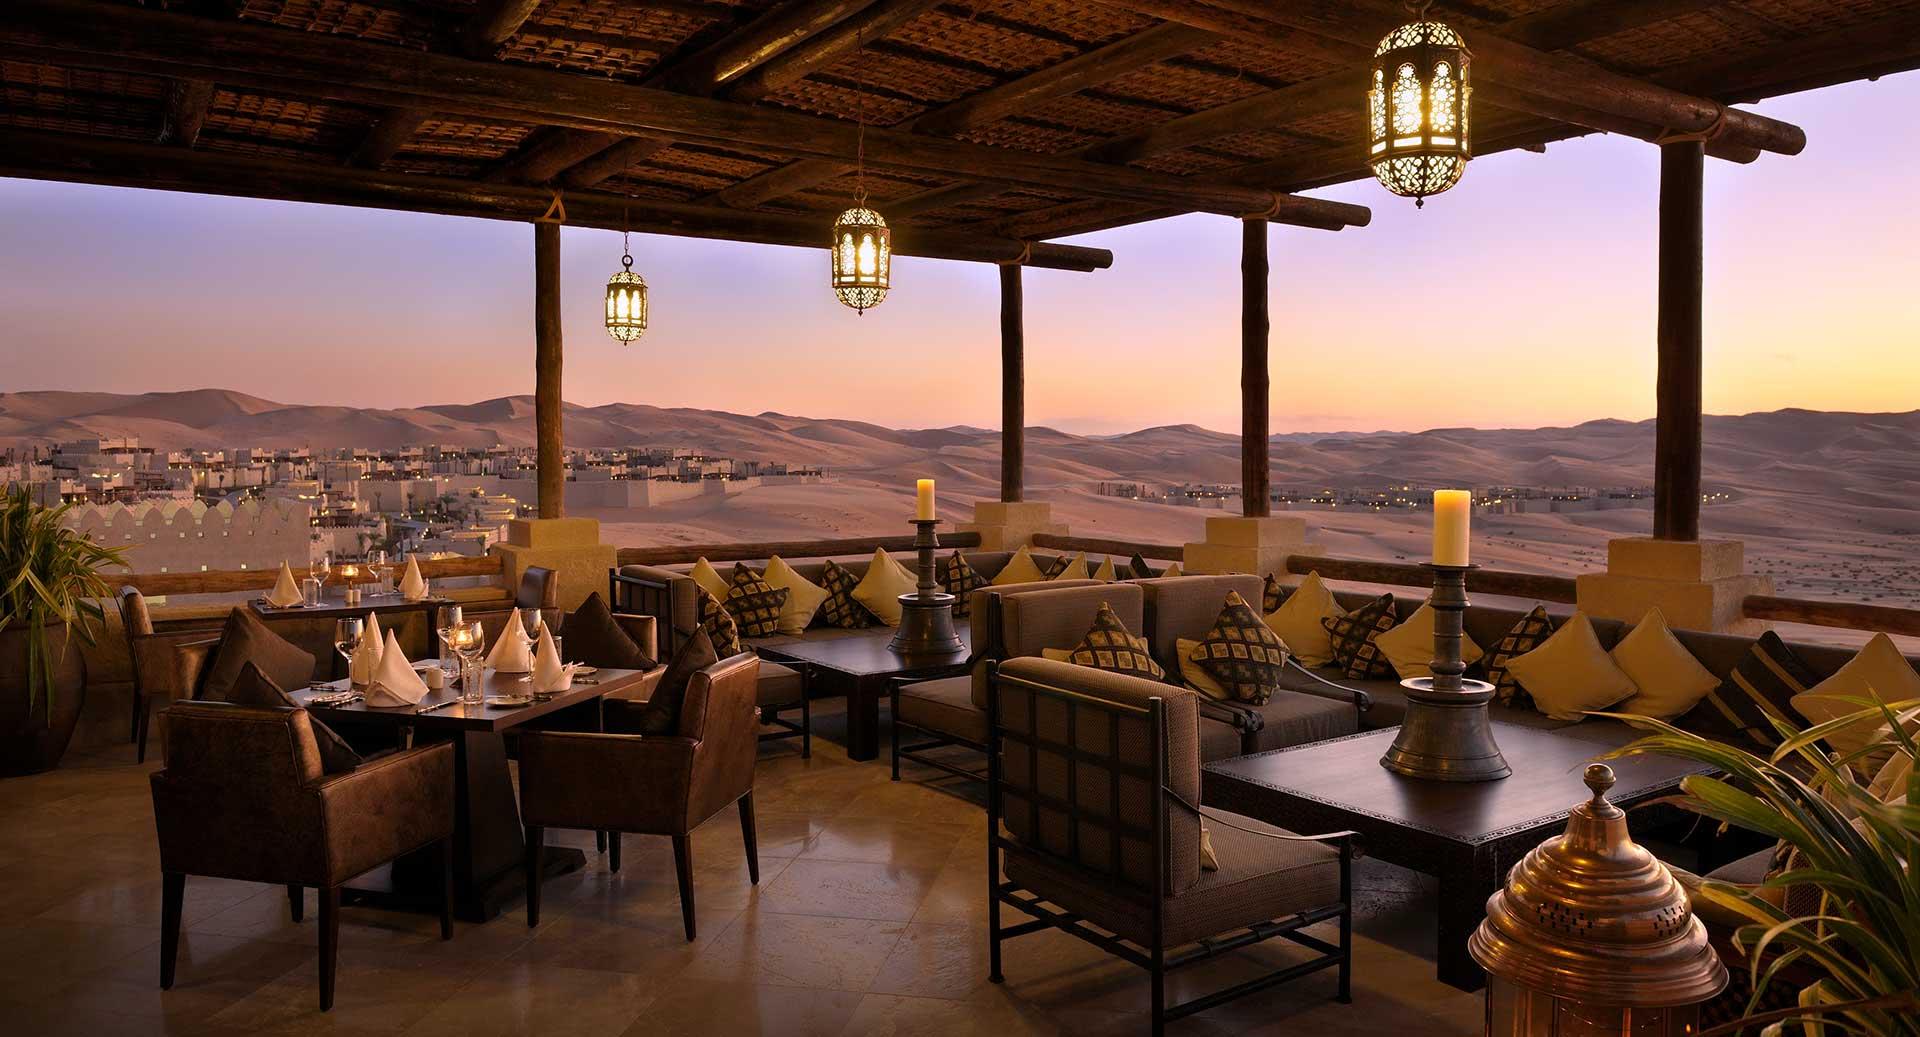 منتجع قصر السراب - مطعم سهيل - Luxuria Tours